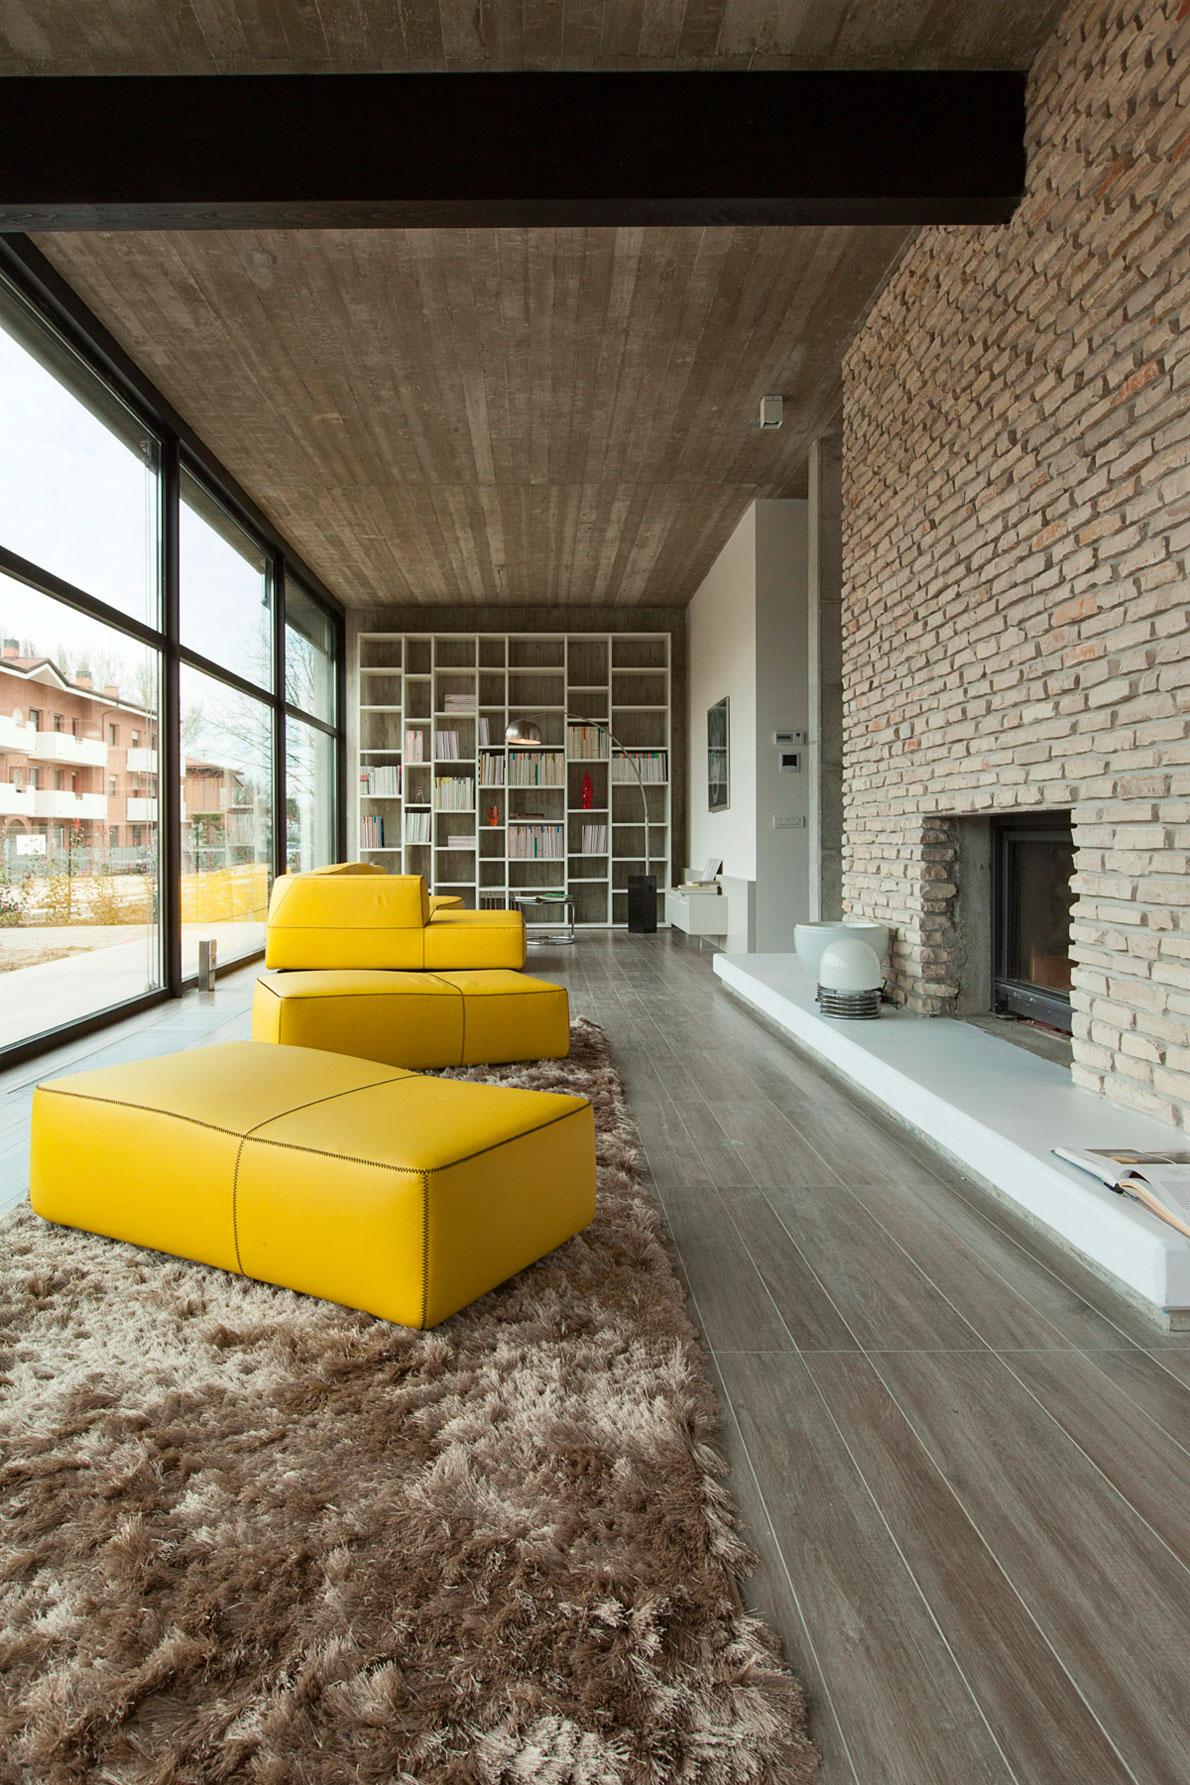 D'Autore Residence near Bologna by Giraldi Associati Architetti-14